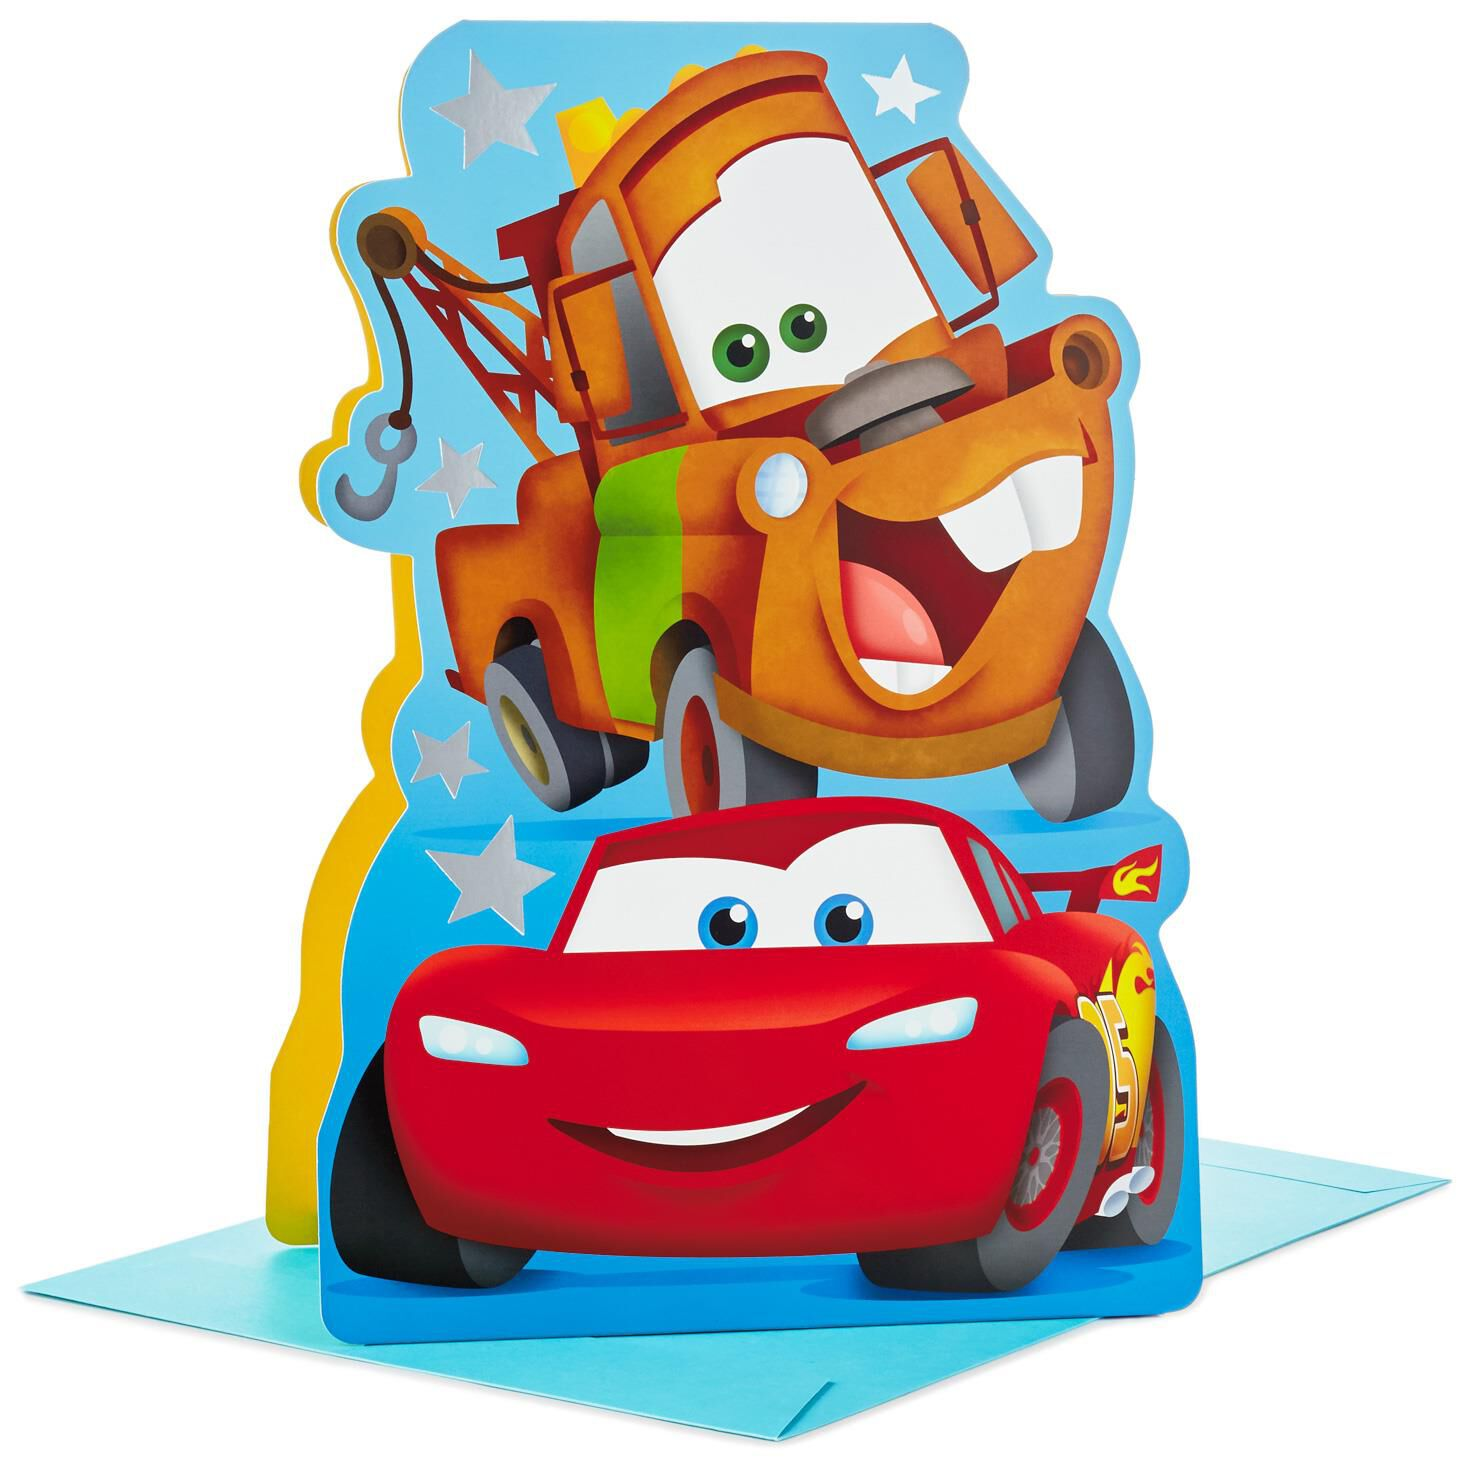 Disney Pixar Cars Lightning McQueen and Mater Stand Up Jumbo